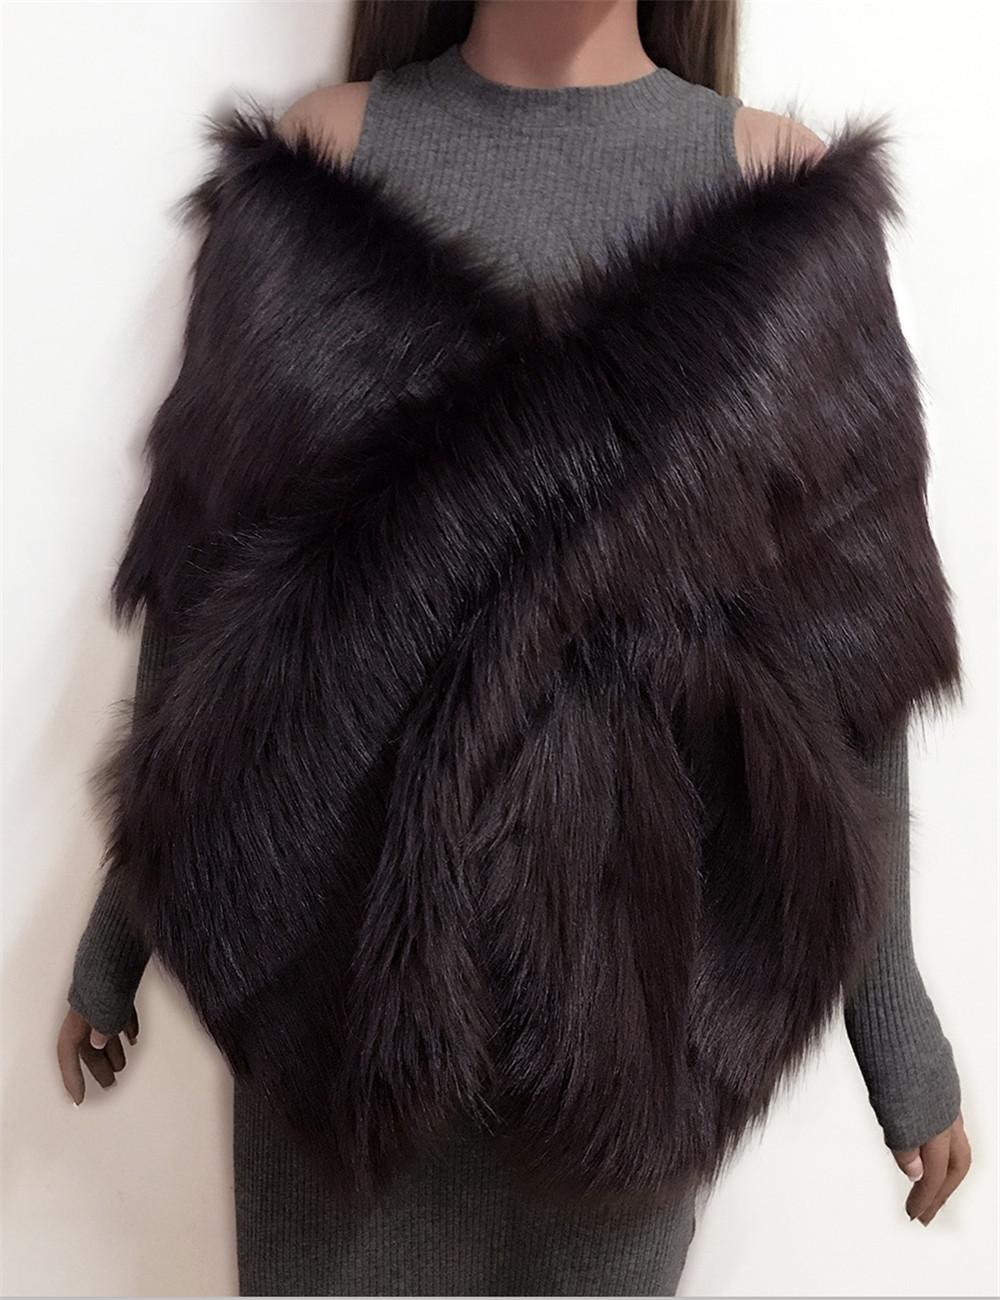 The autumn and winter new imitation fur big cape neck scarf multi-color joker scarf bride dress cross cape (11)